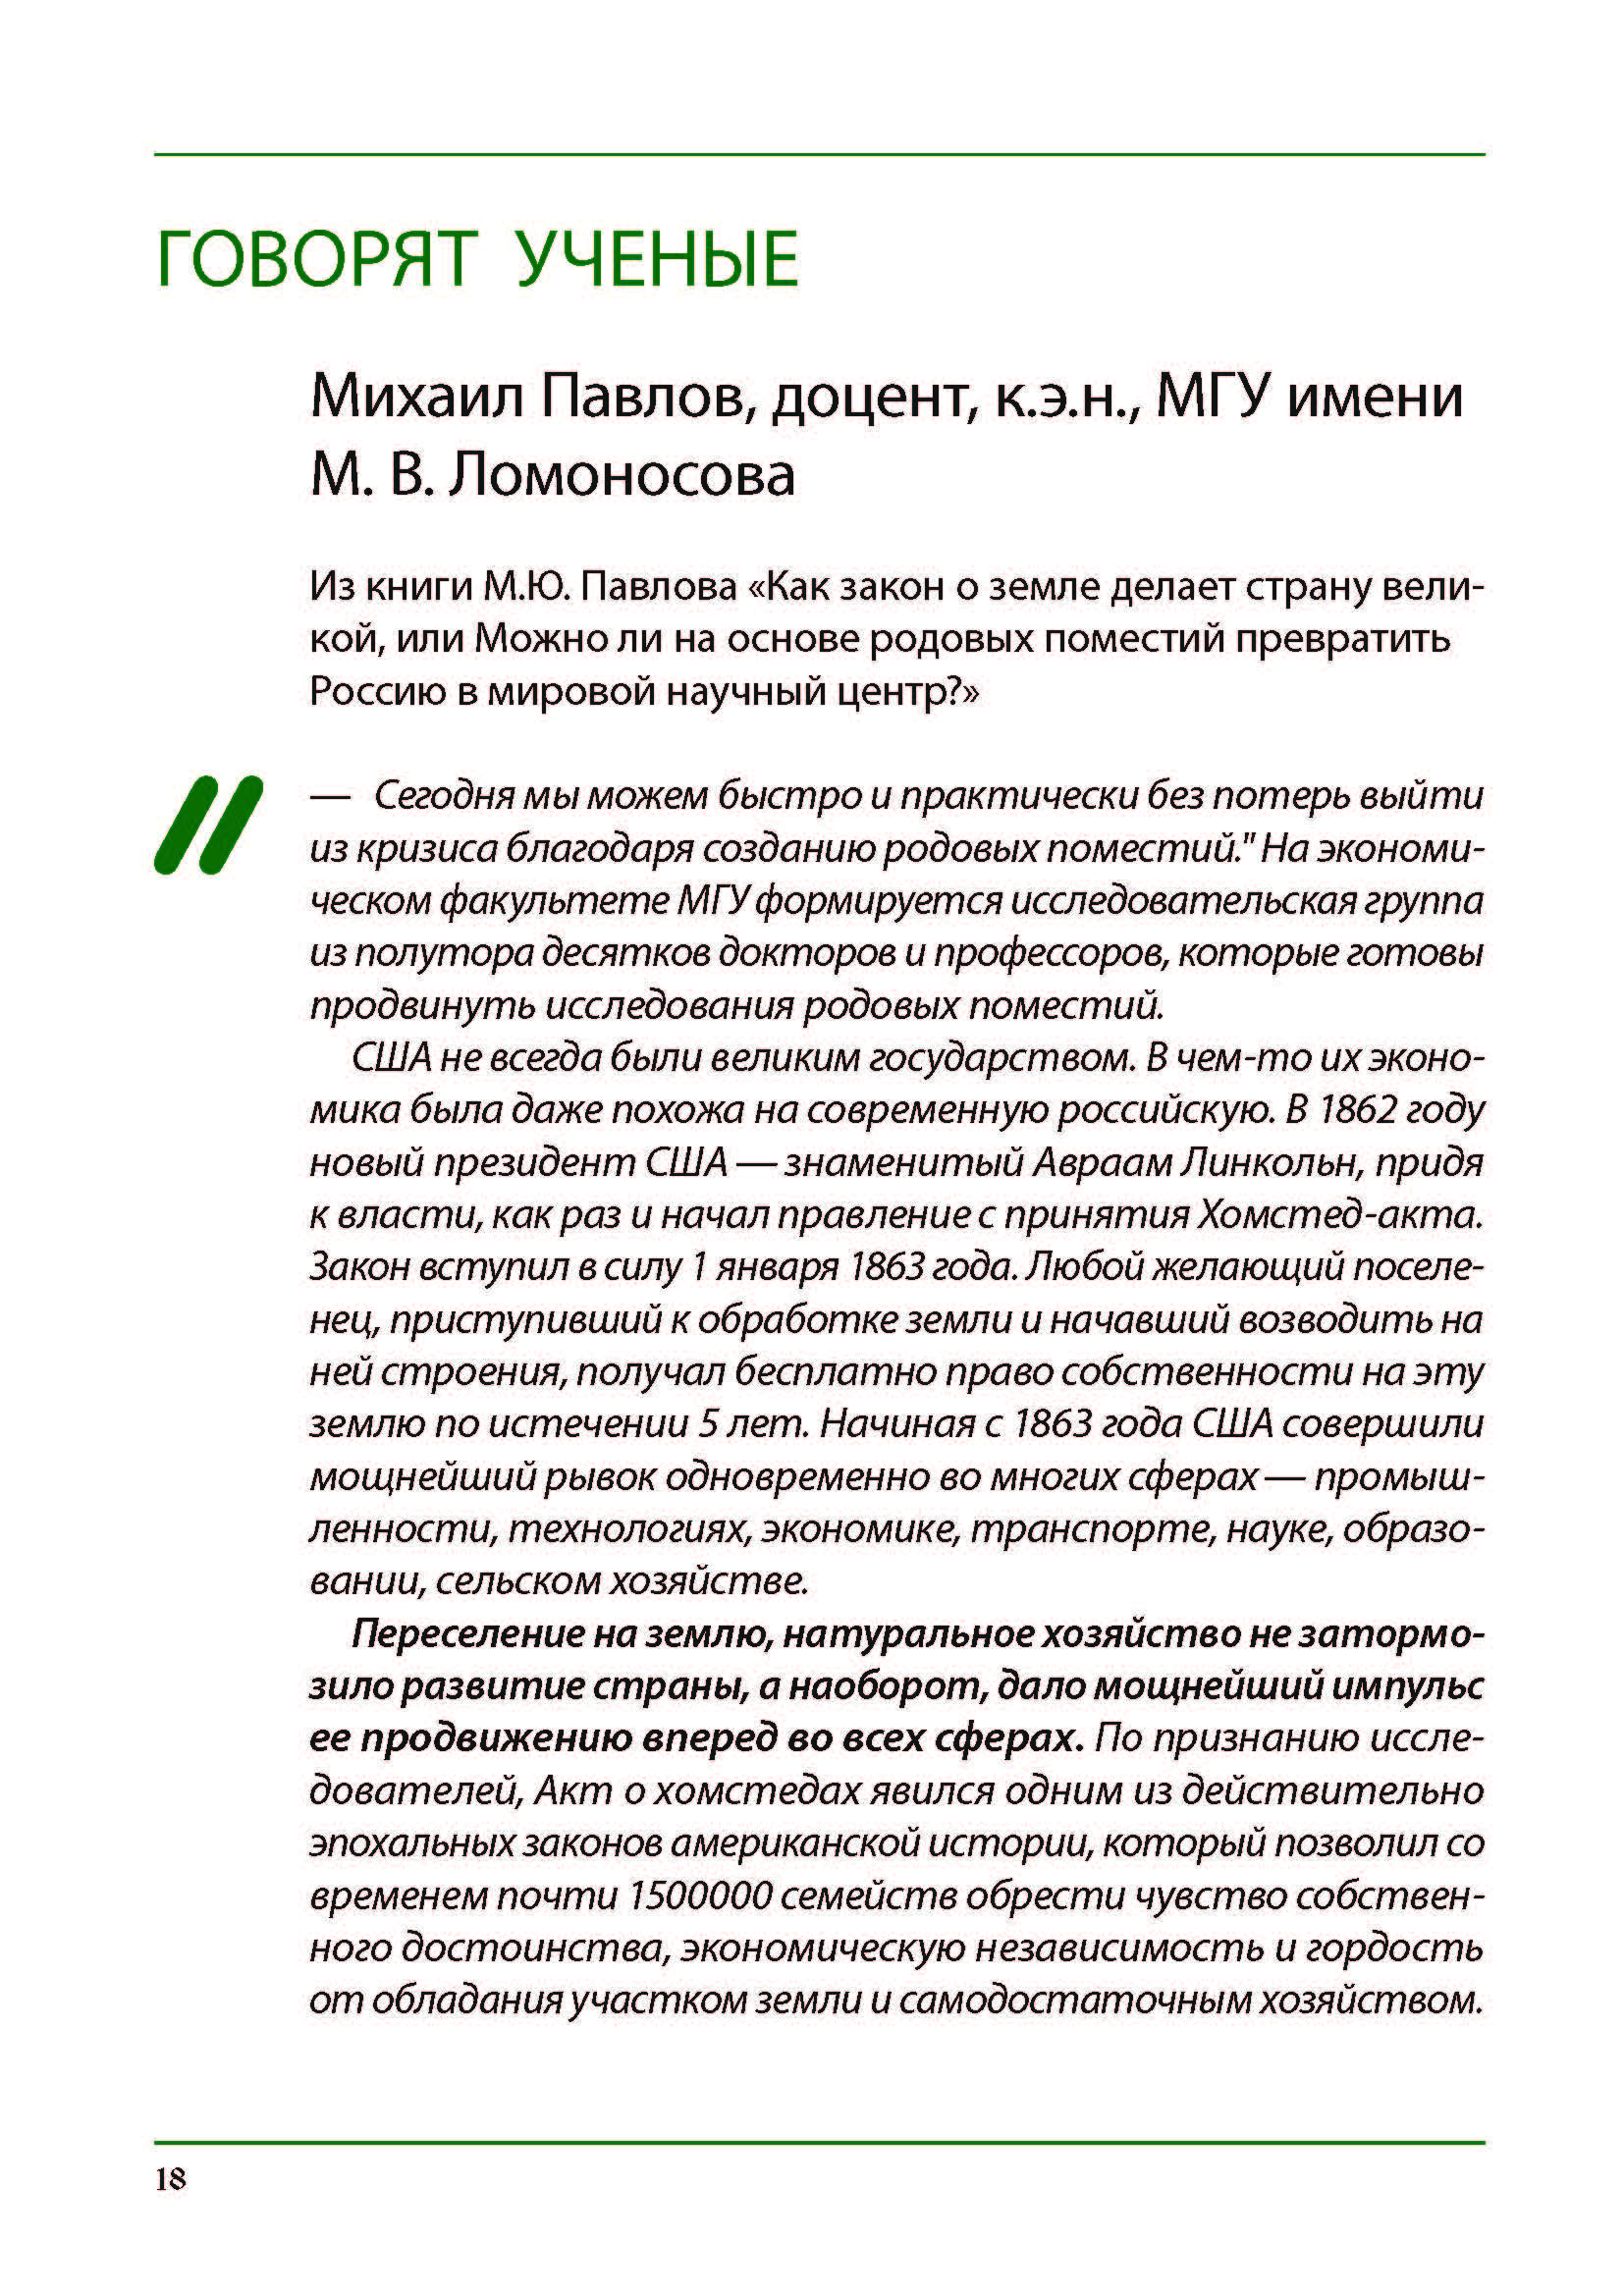 Фонд Поправка Конституция (18).jpg